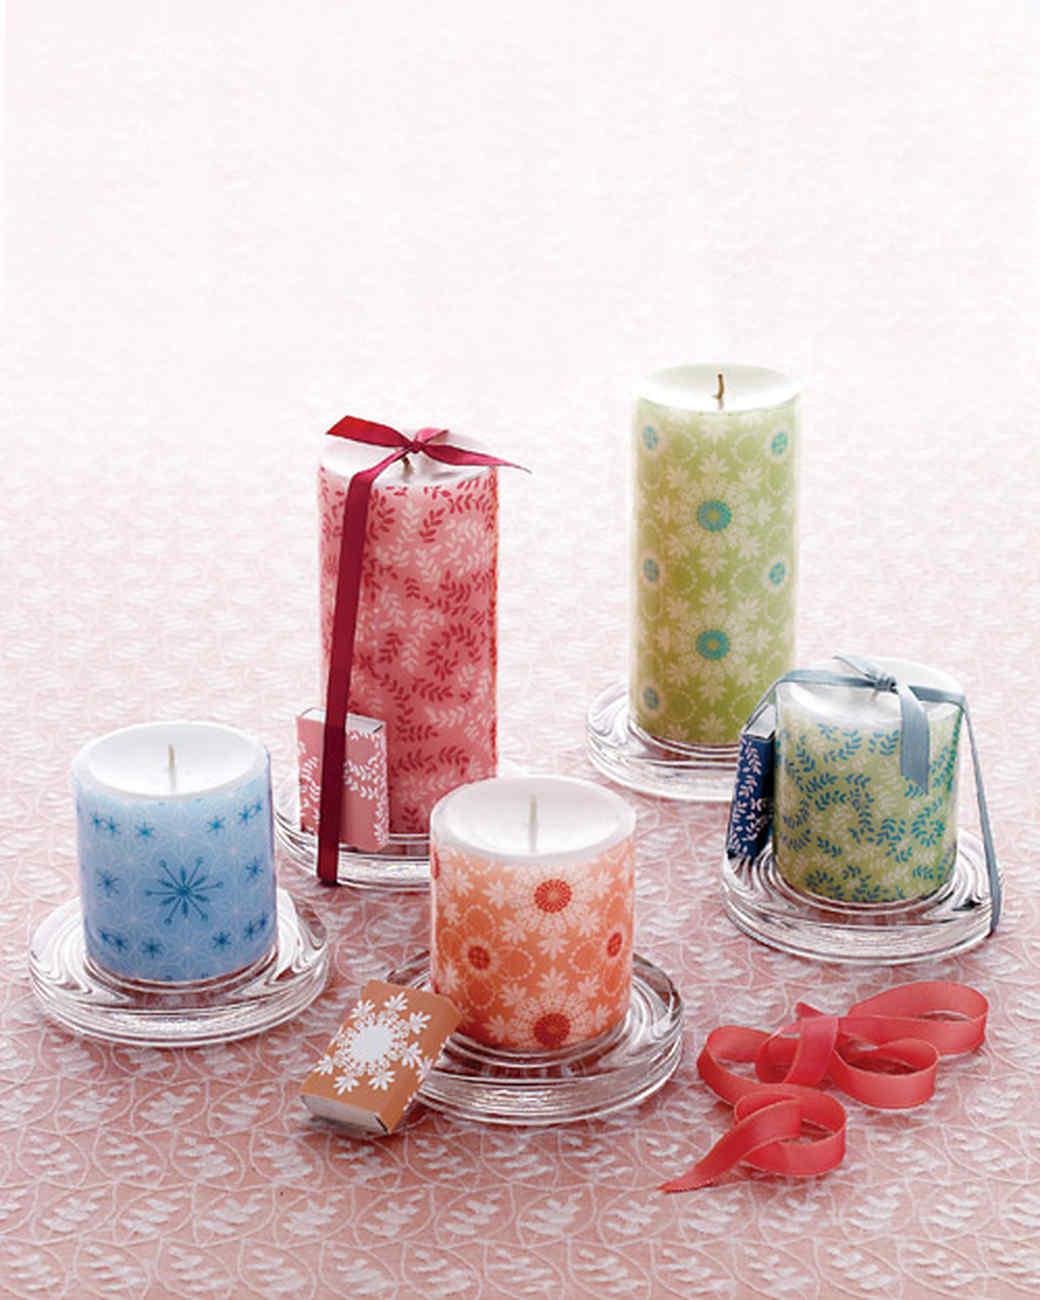 Candle Decoration Part - 24: Decorative Decal Pillar Candles